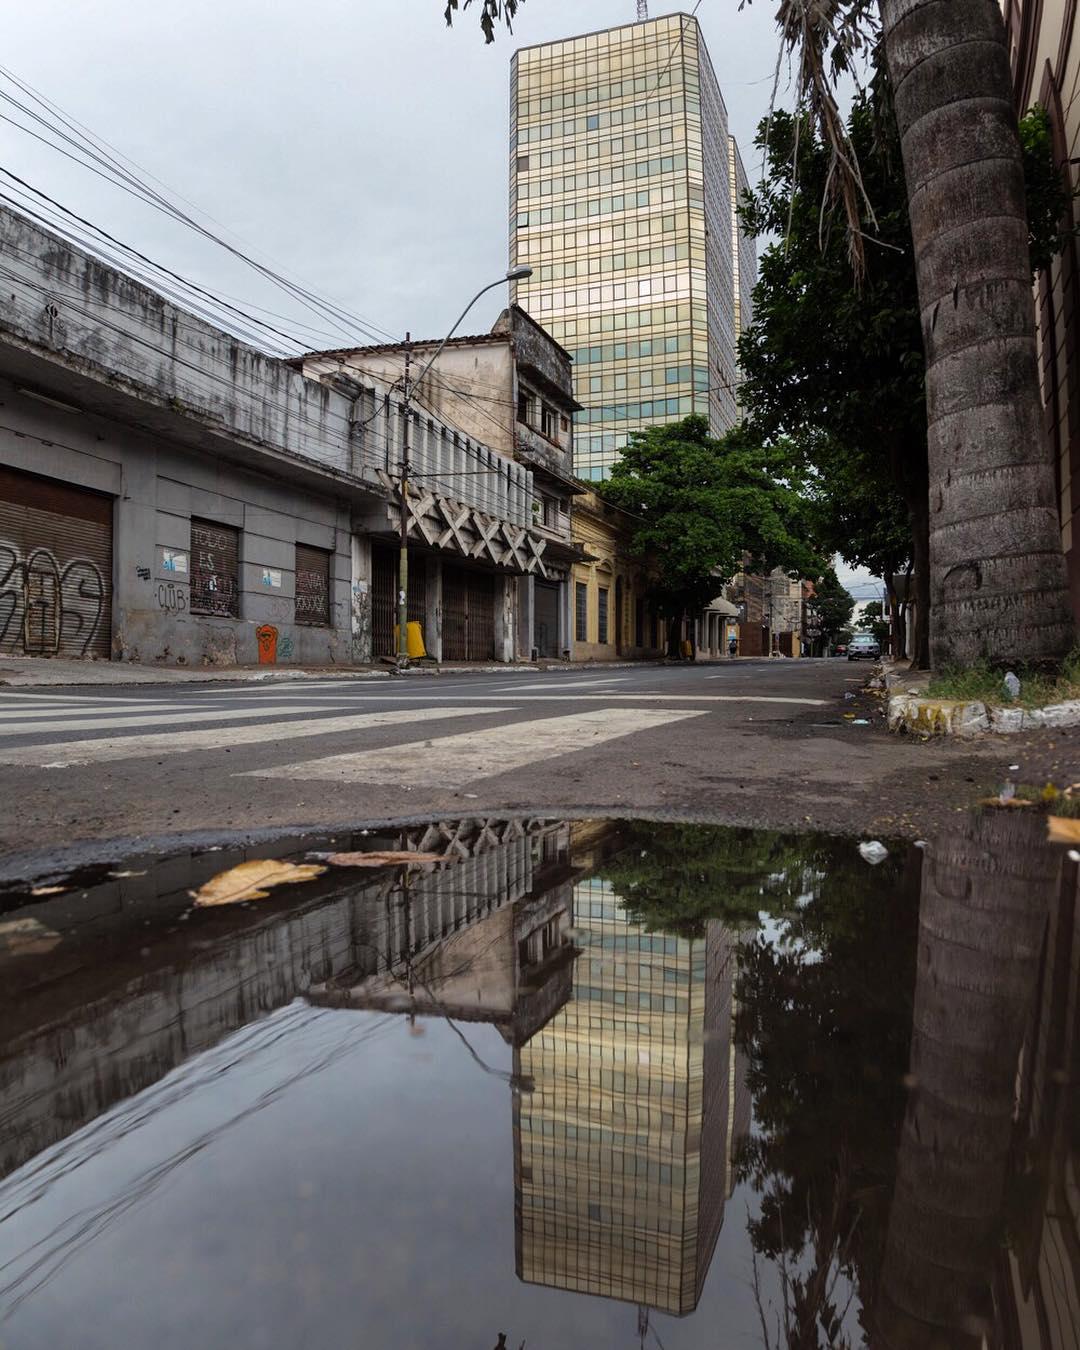 © Juan Carlos Meza, Fotociclo